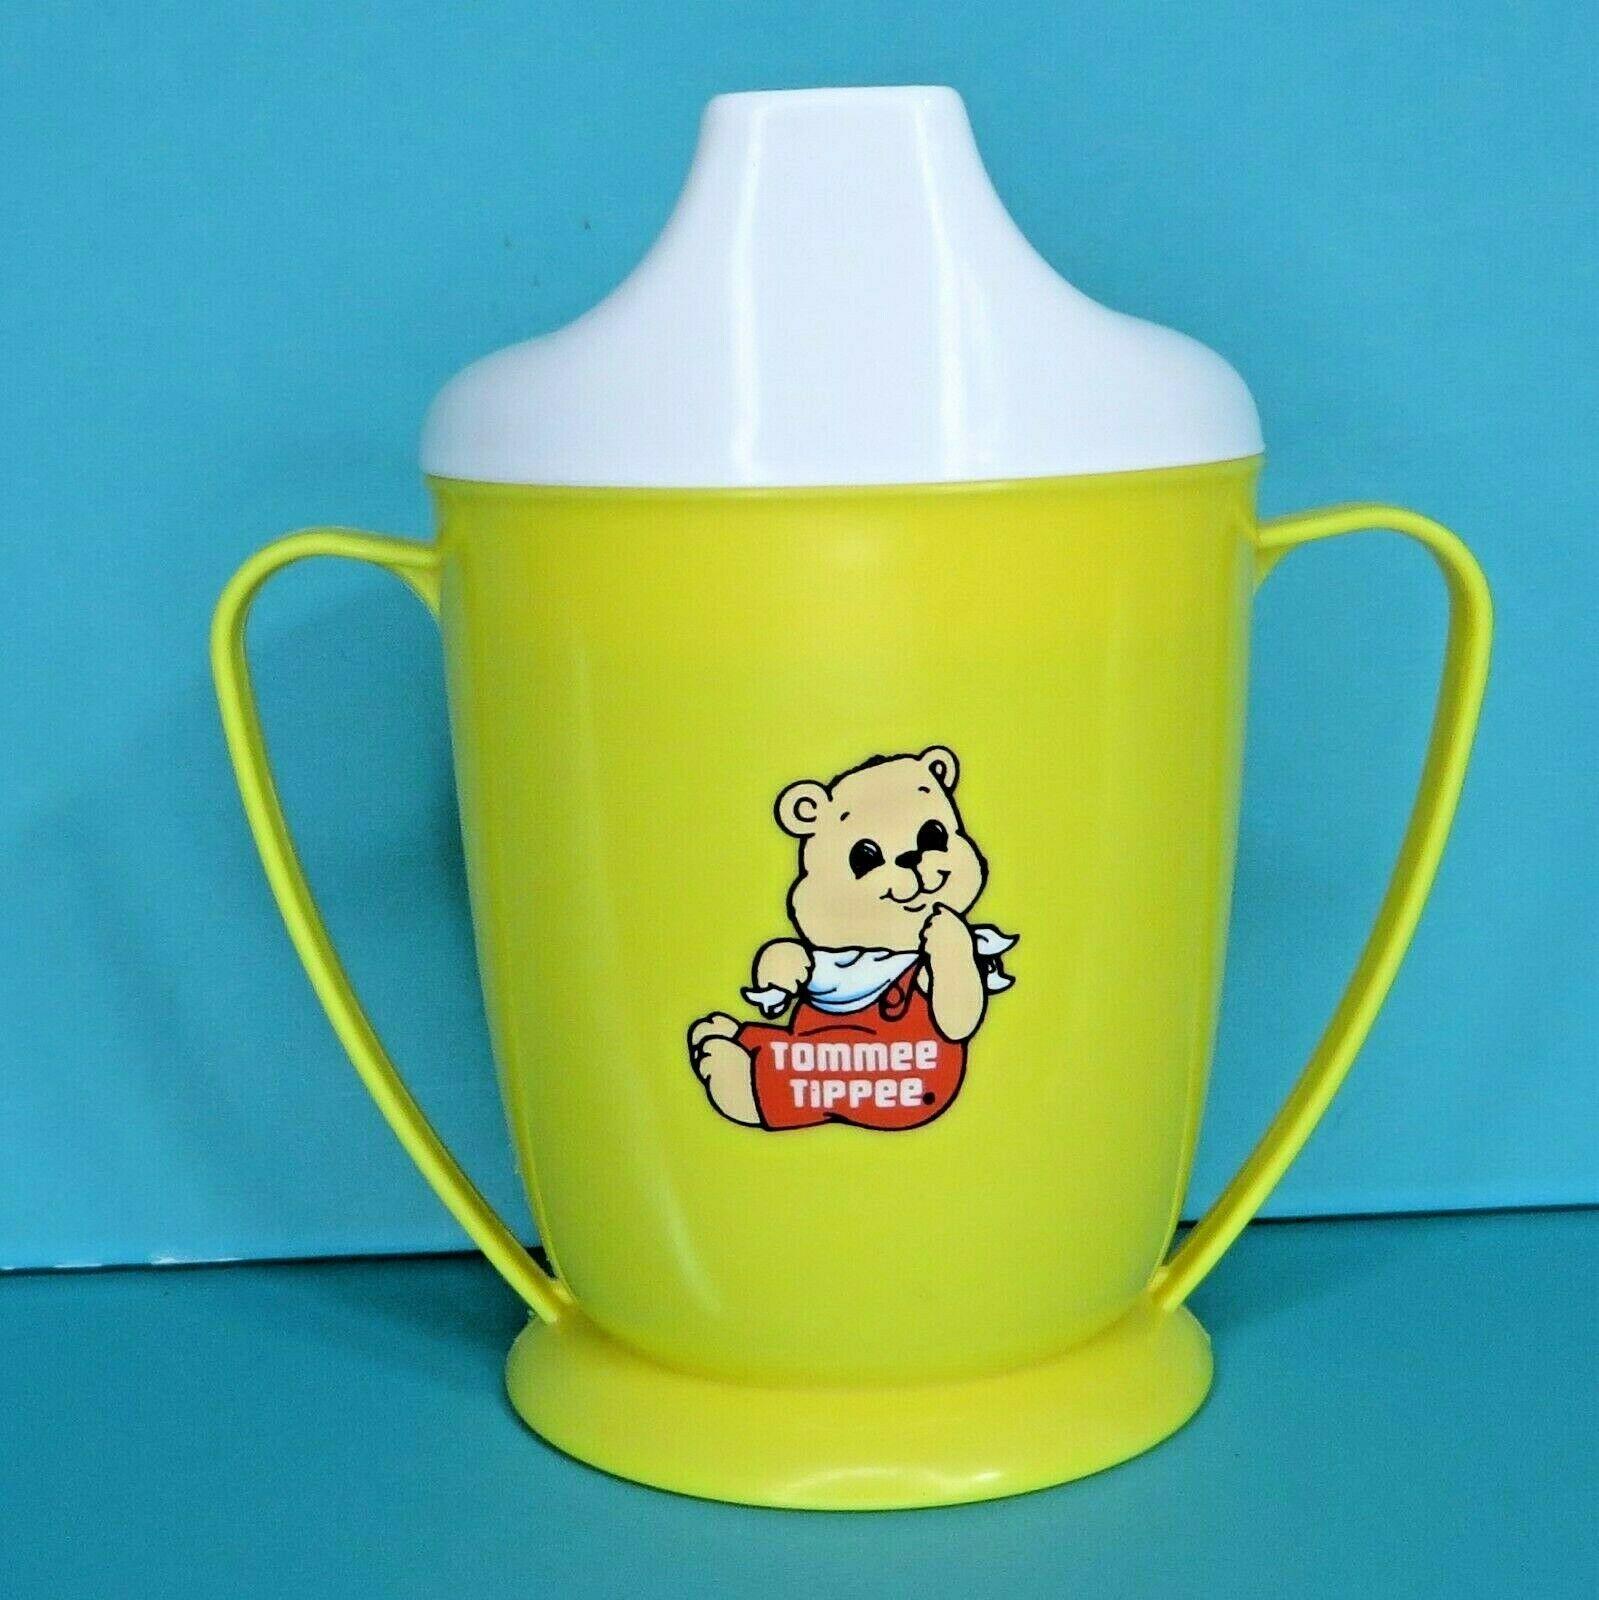 Tommee Tippee Teddy Bear Yellow Sippy Cup White Lid Vintage 1989 Playskool Baby - $14.95